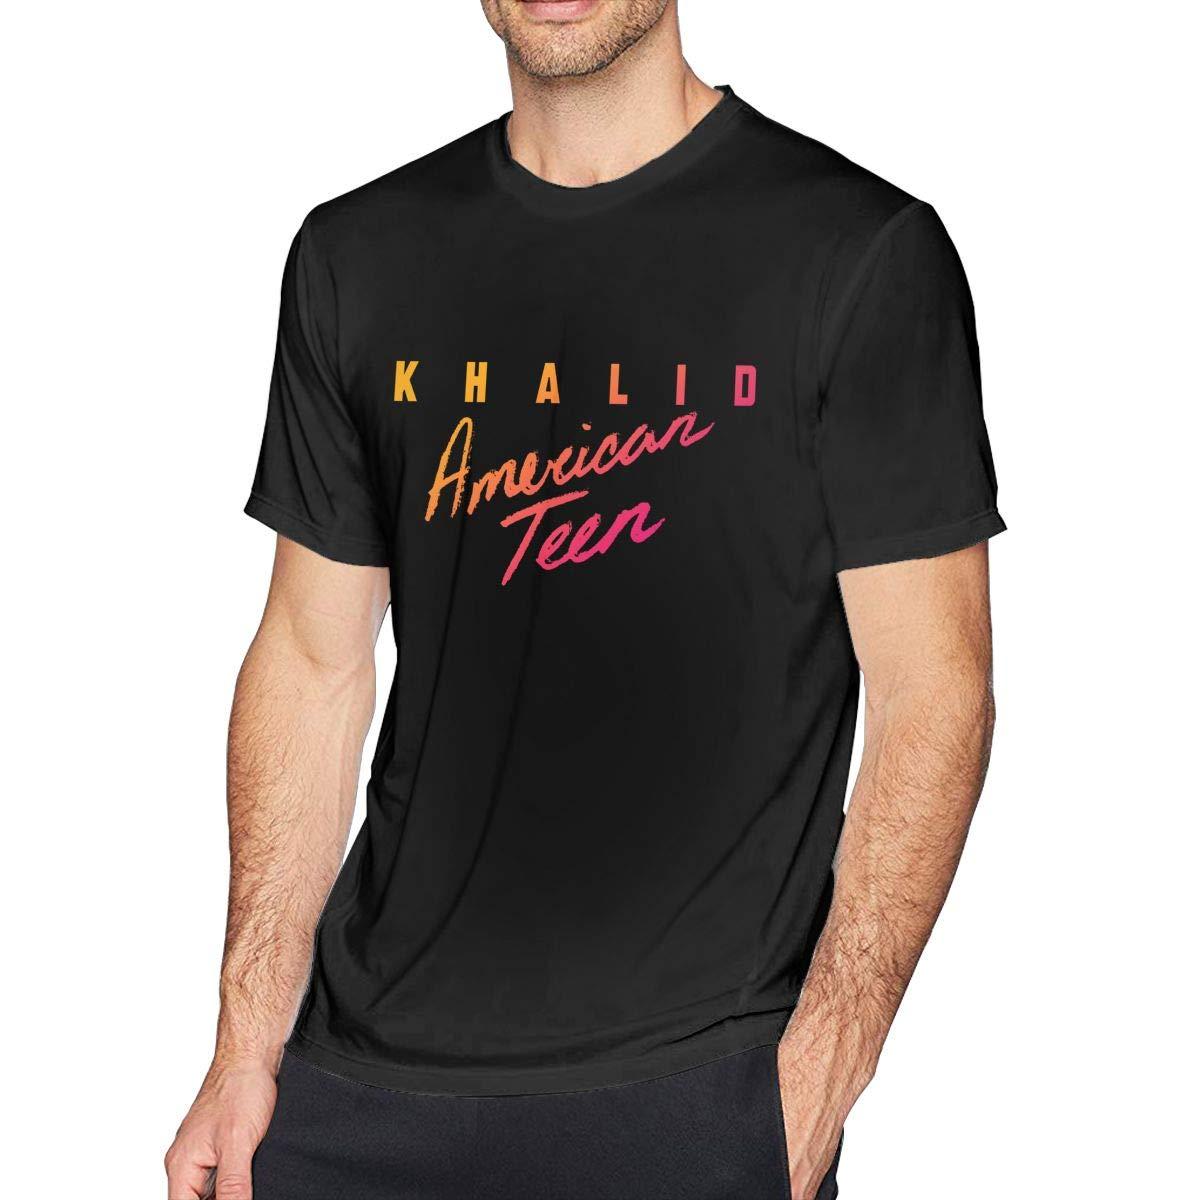 FengYuqi Khalid American Teen Mans Classic Short Sleeve T-Shirt Athletic Cool Running T-Shirt Black